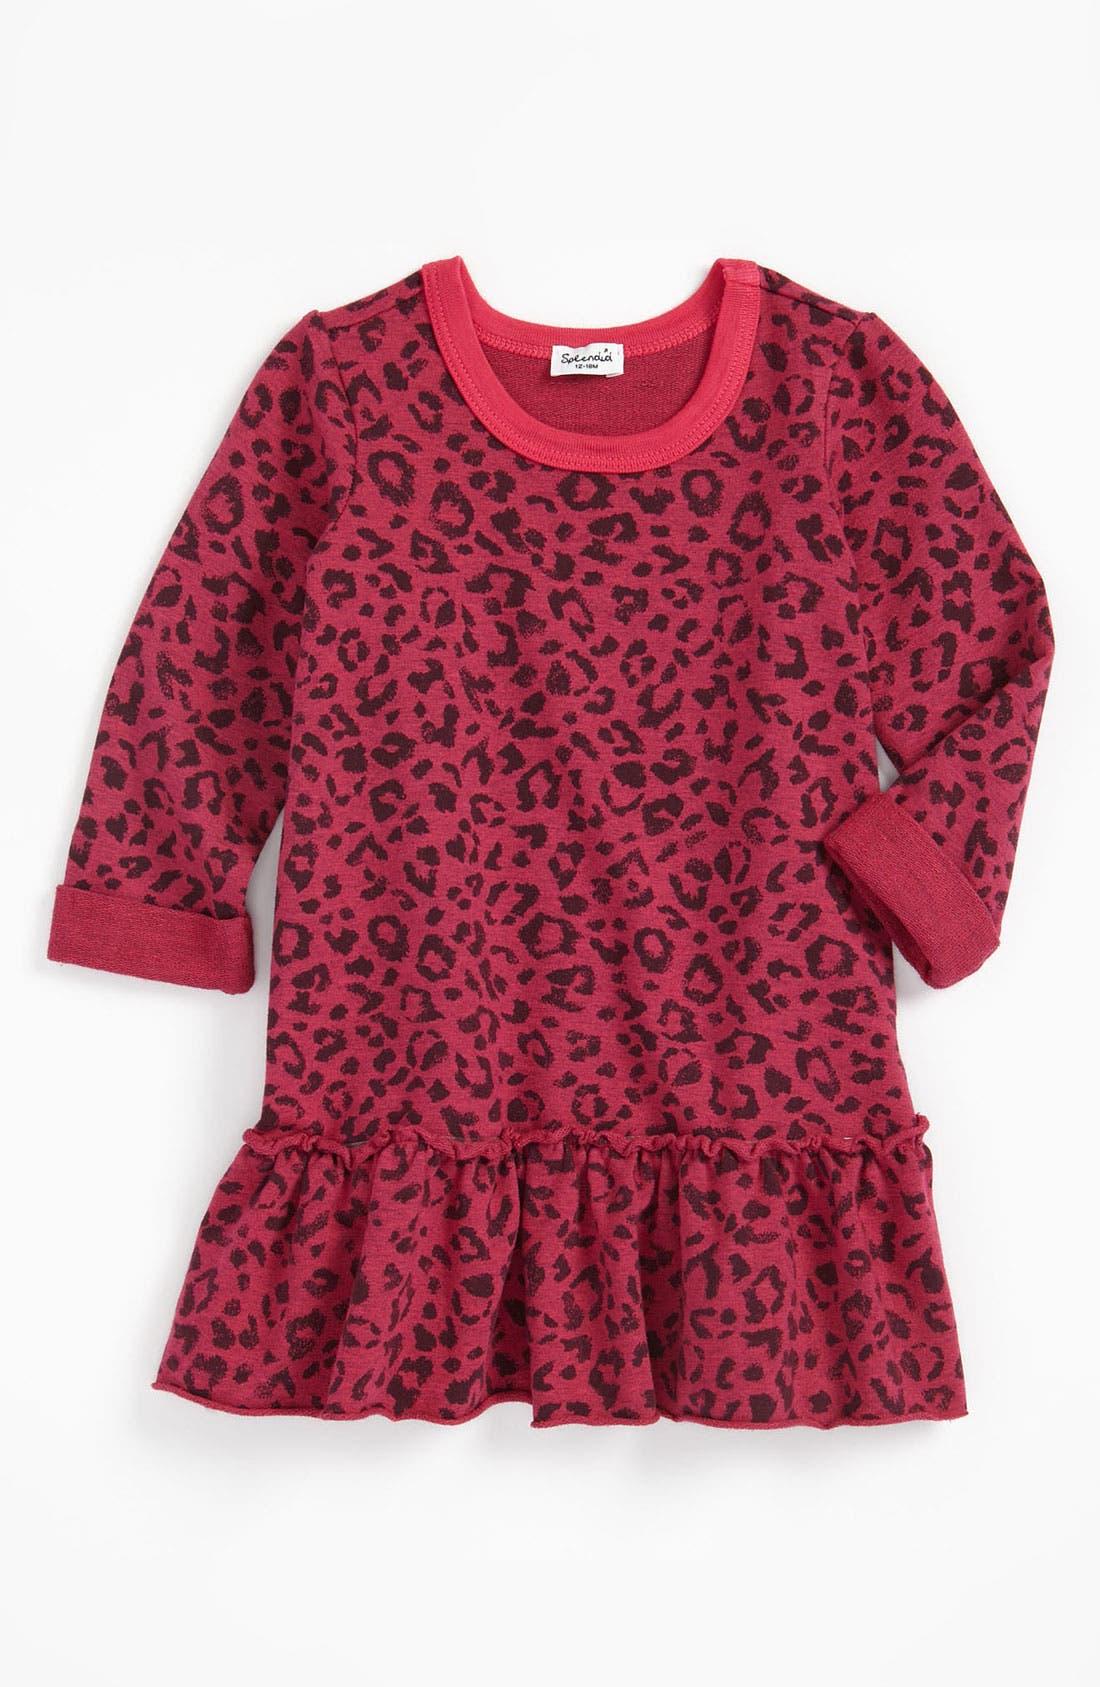 Alternate Image 1 Selected - Splendid Leopard Print Dress (Toddler)